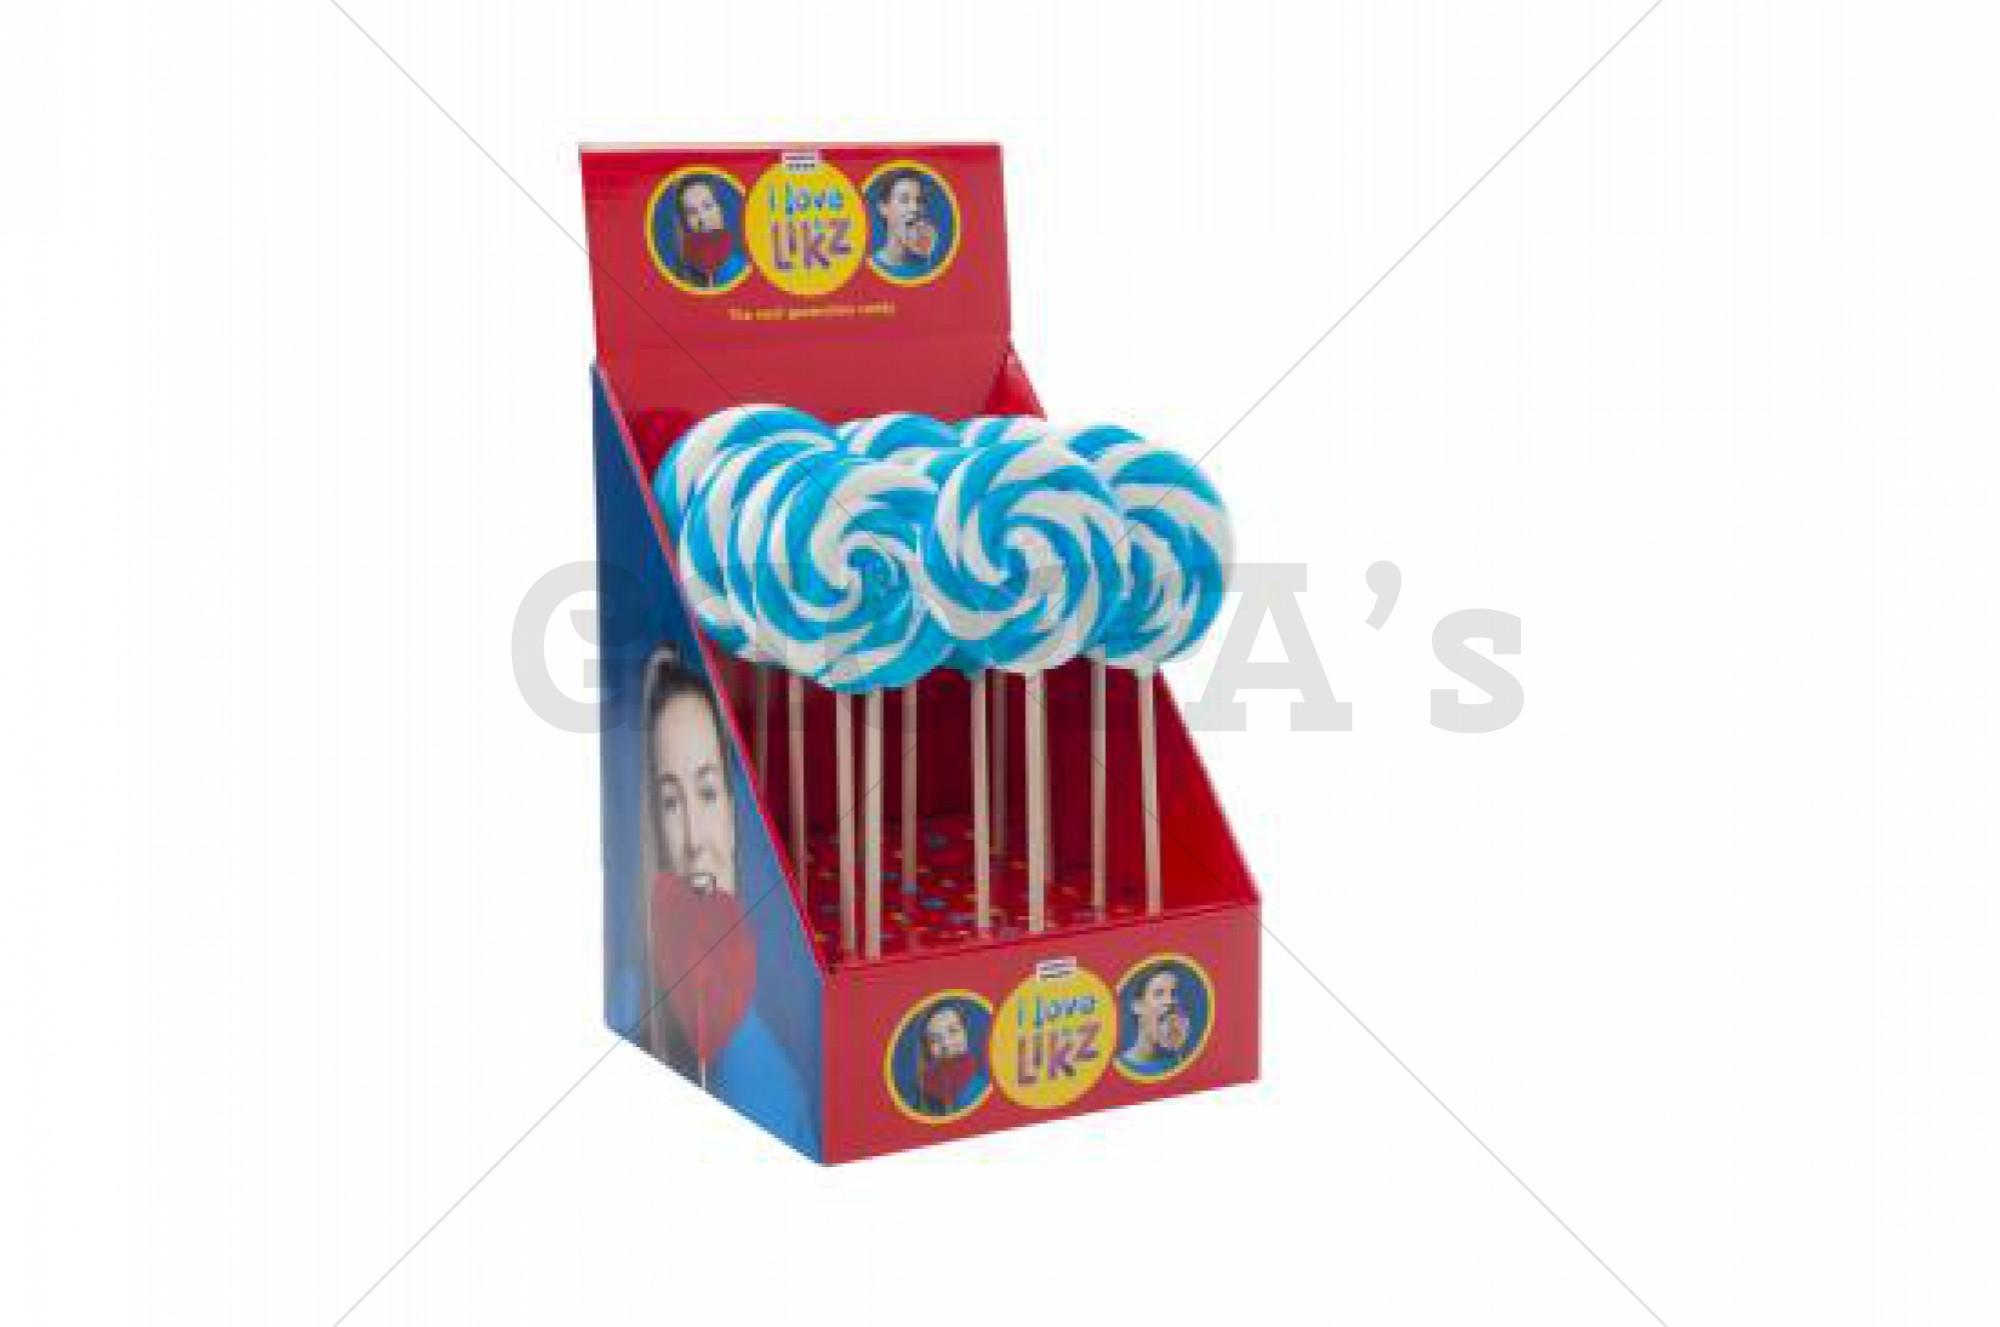 Themasnoep - Spiraal lolly Blauw 9 cm prijs is per stuk.